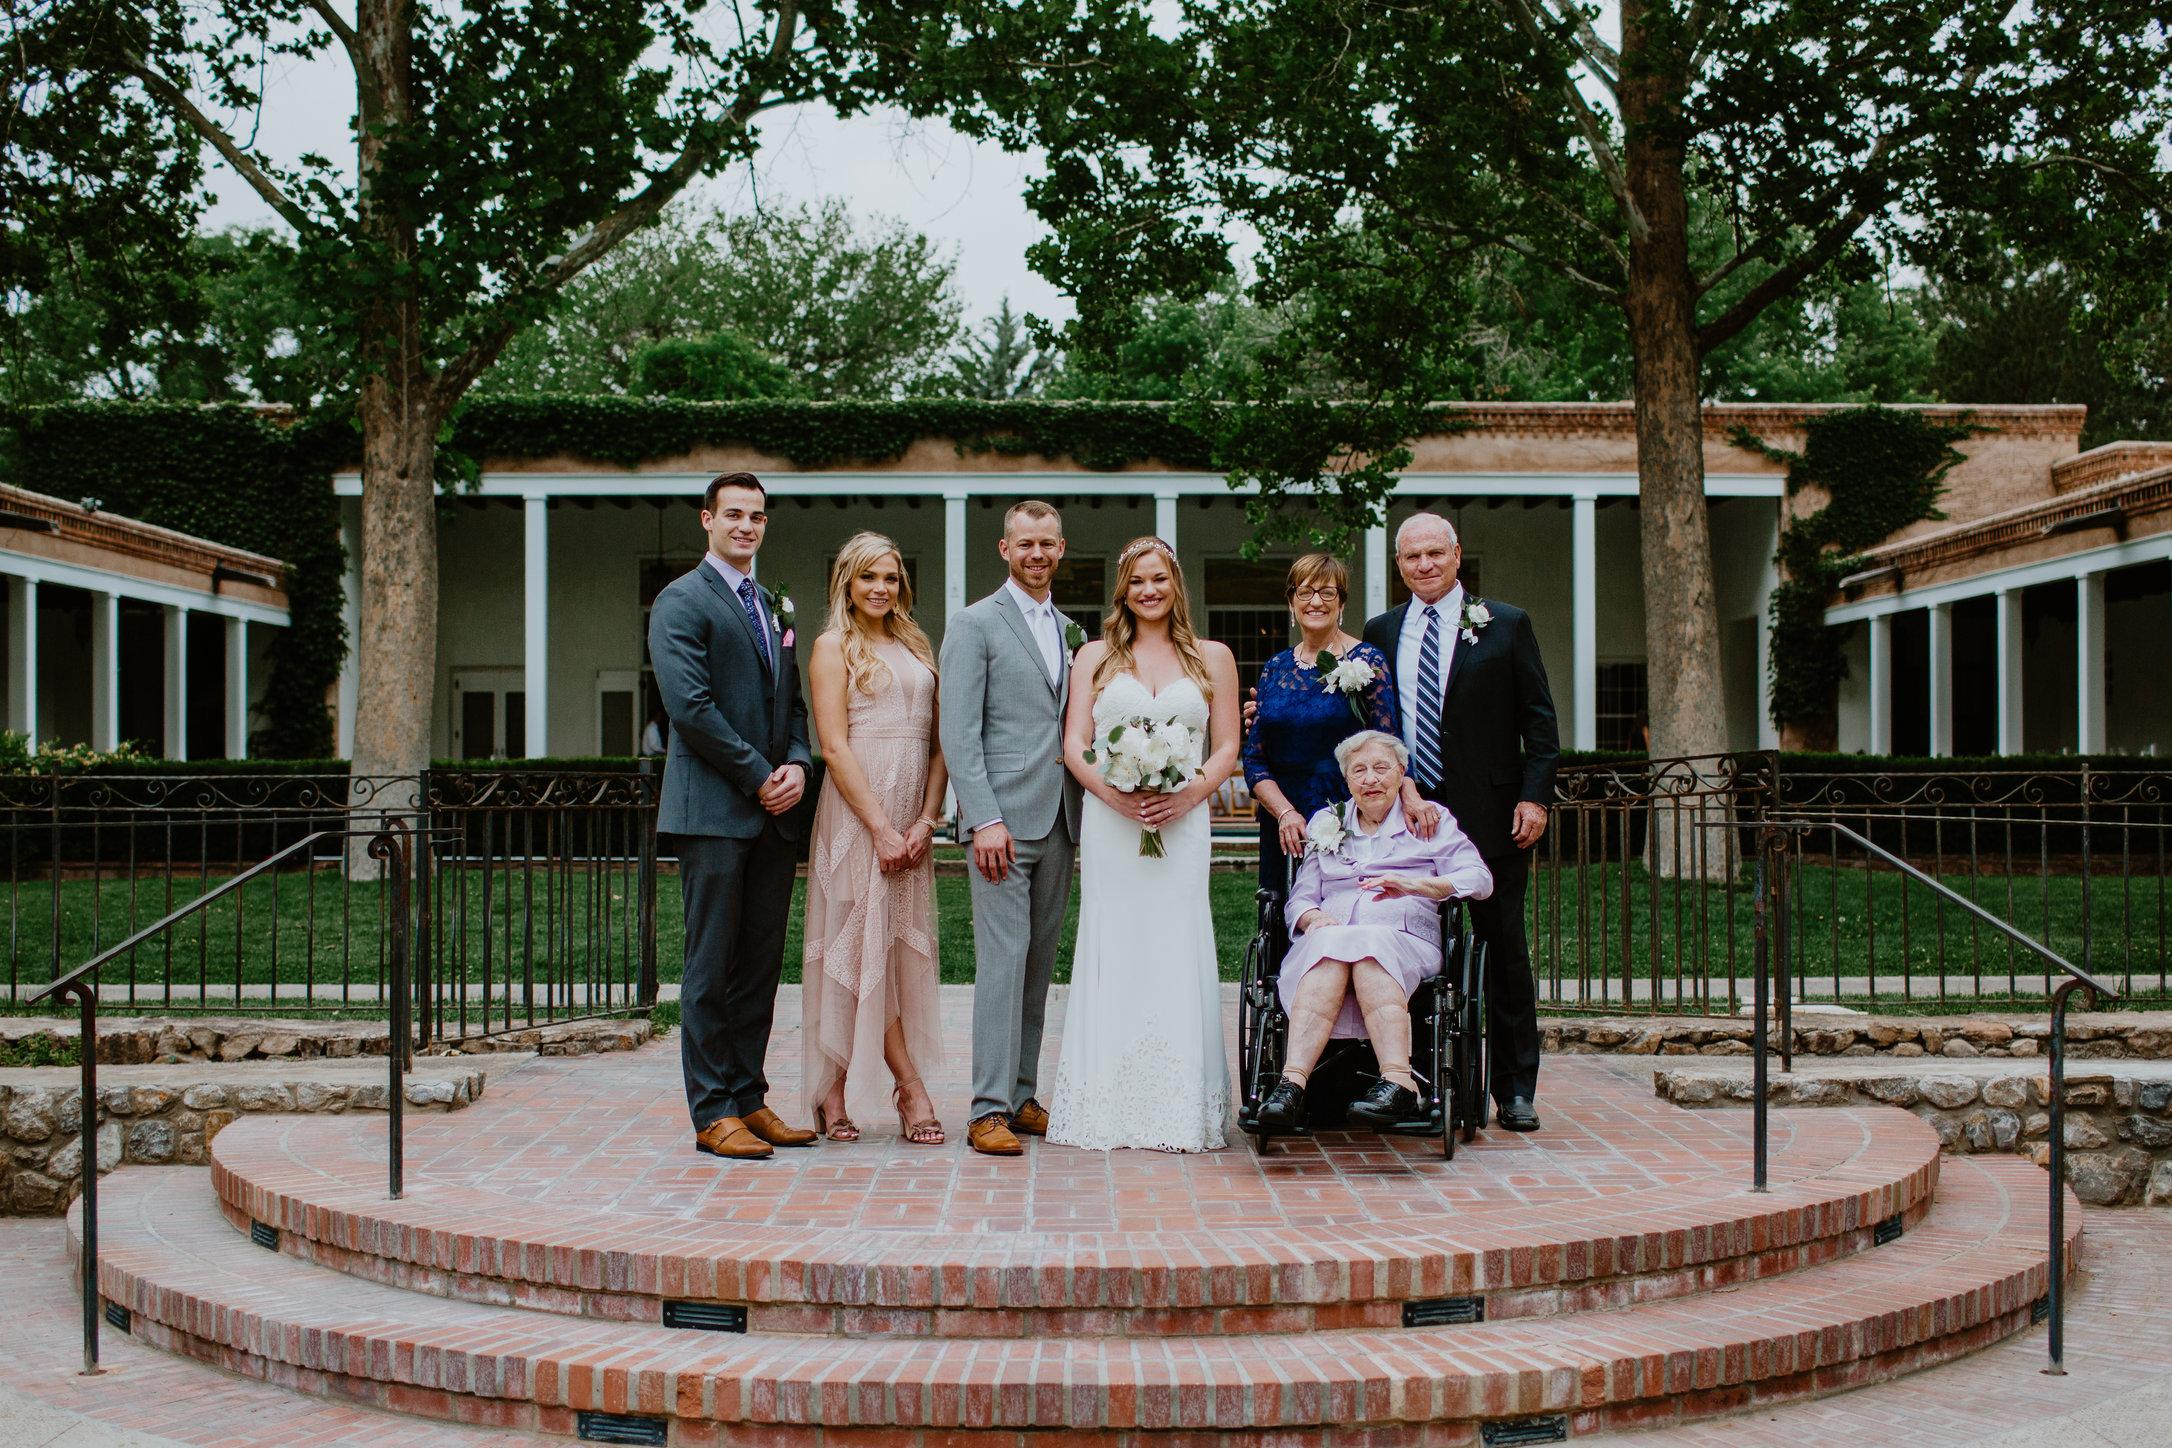 DandA-wedding-455.jpg